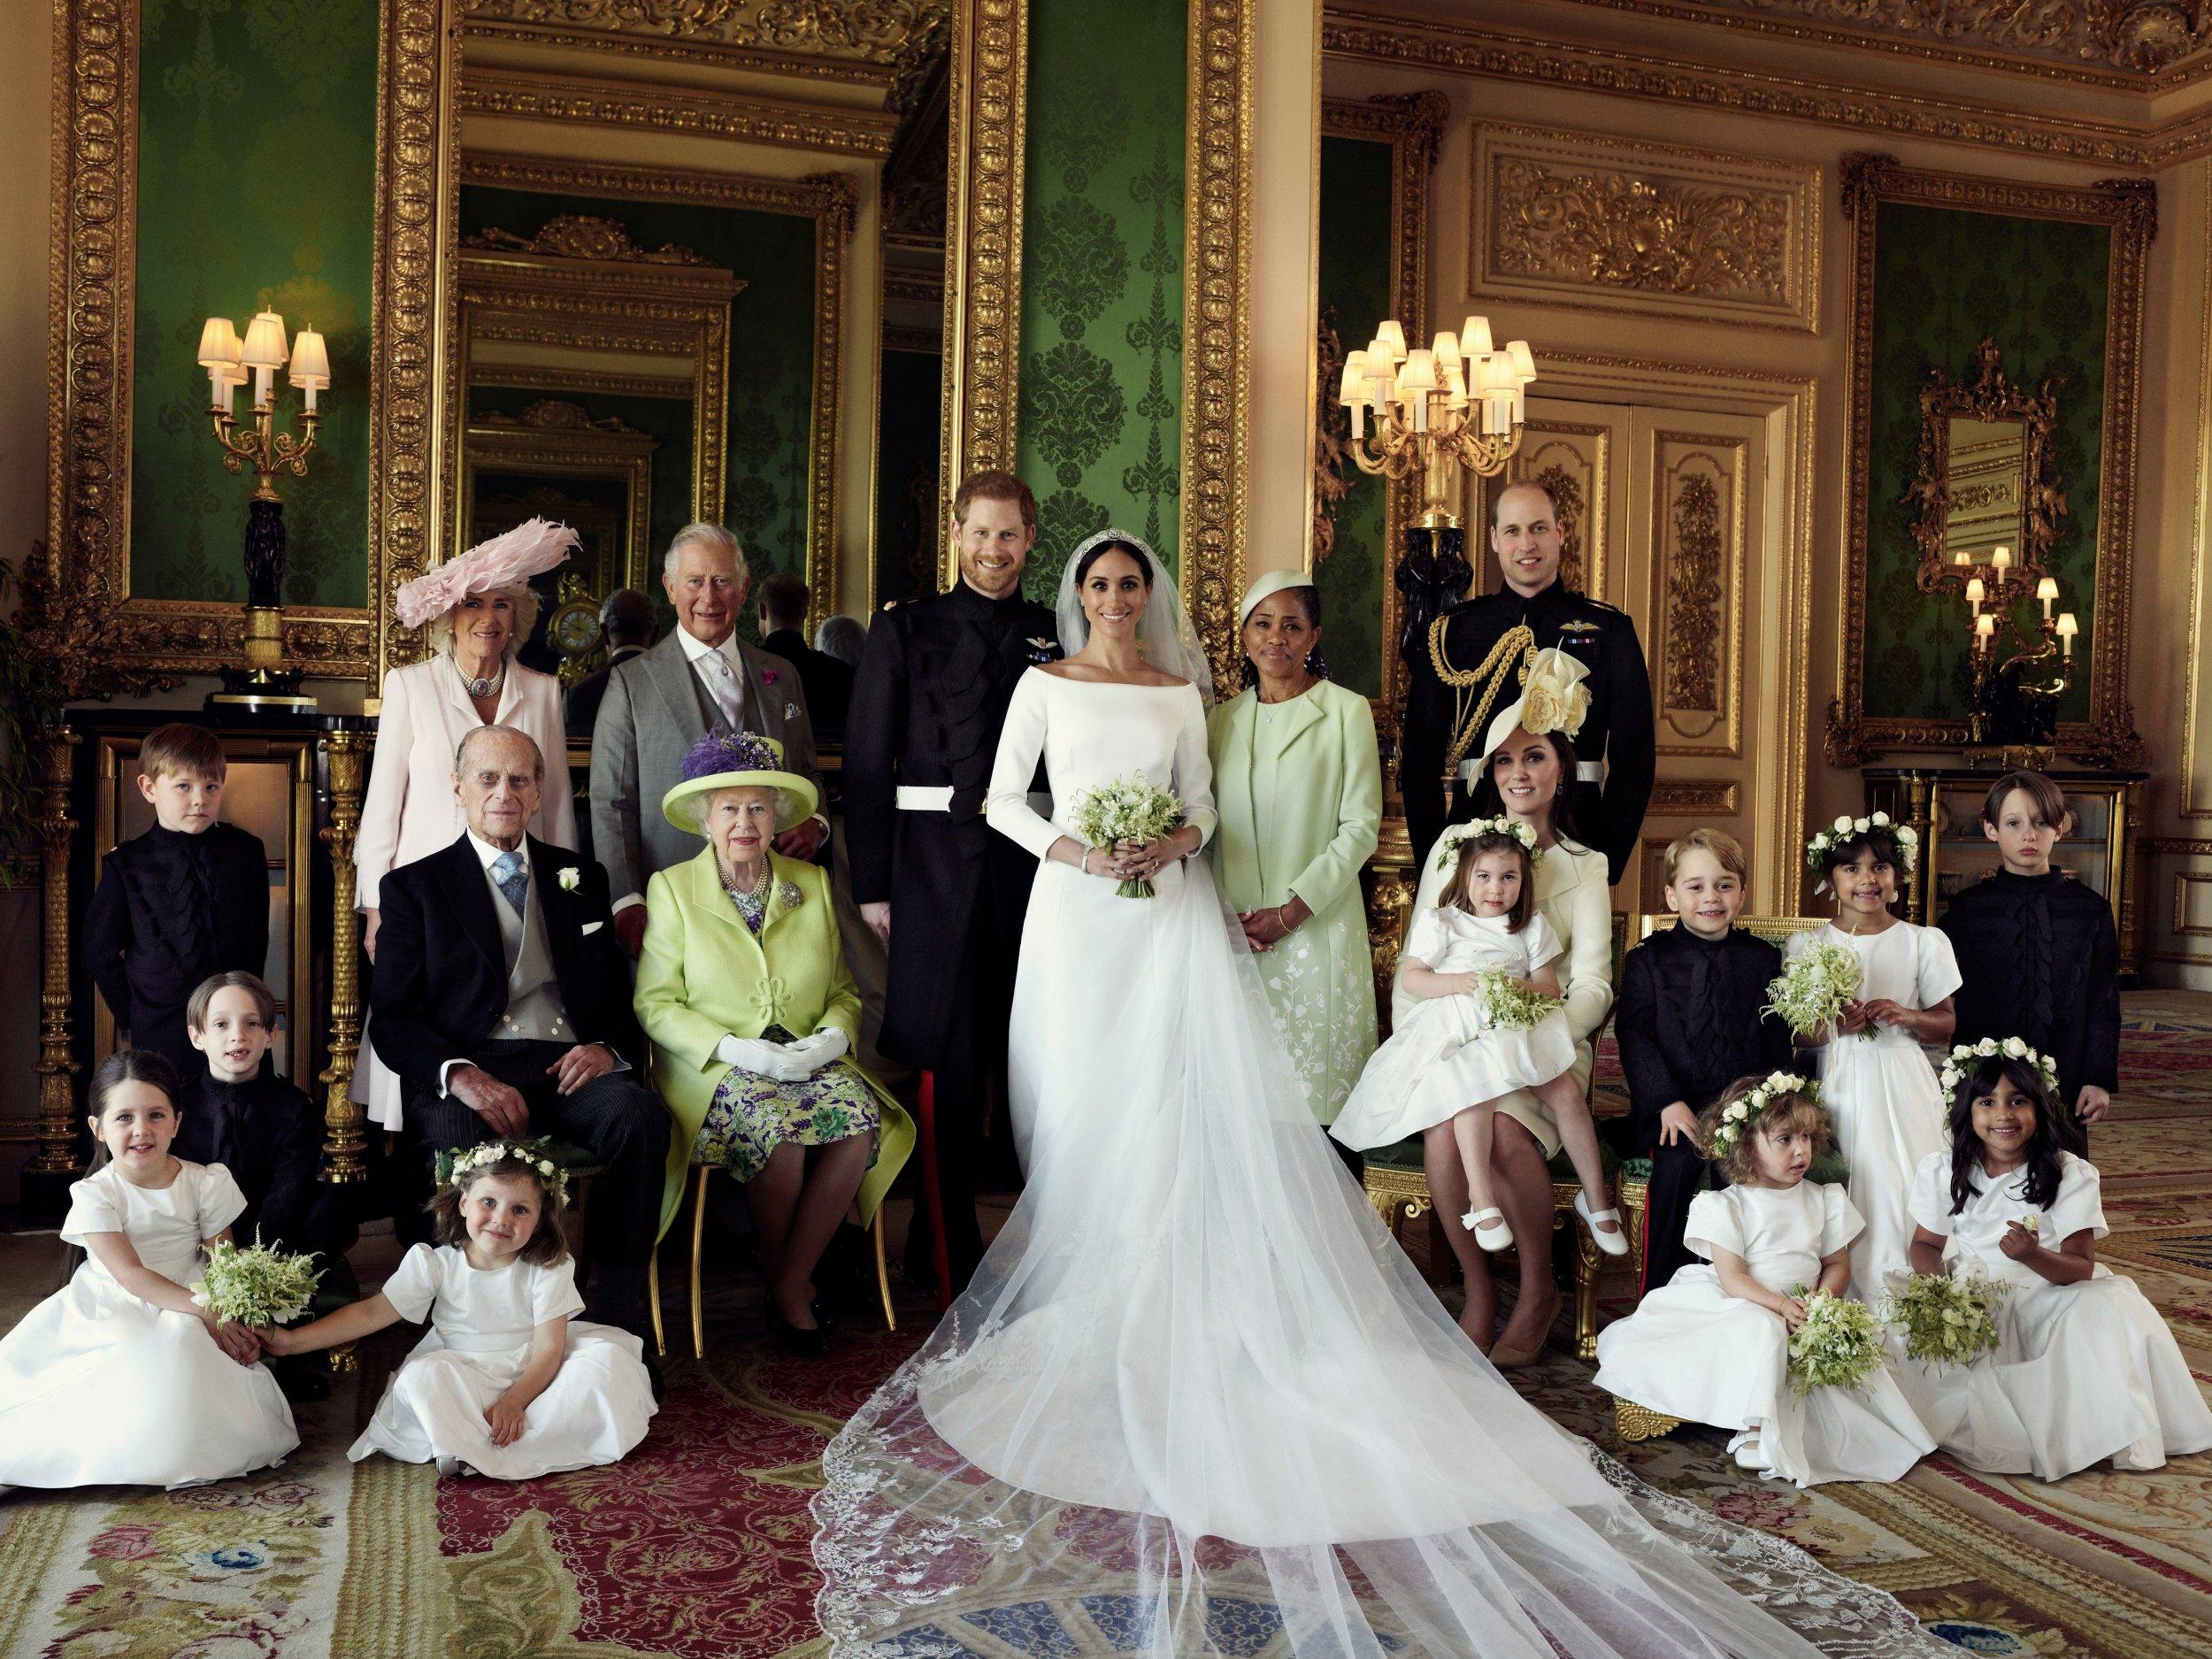 How To Buy Meghan Markle S Royal Wedding Dress